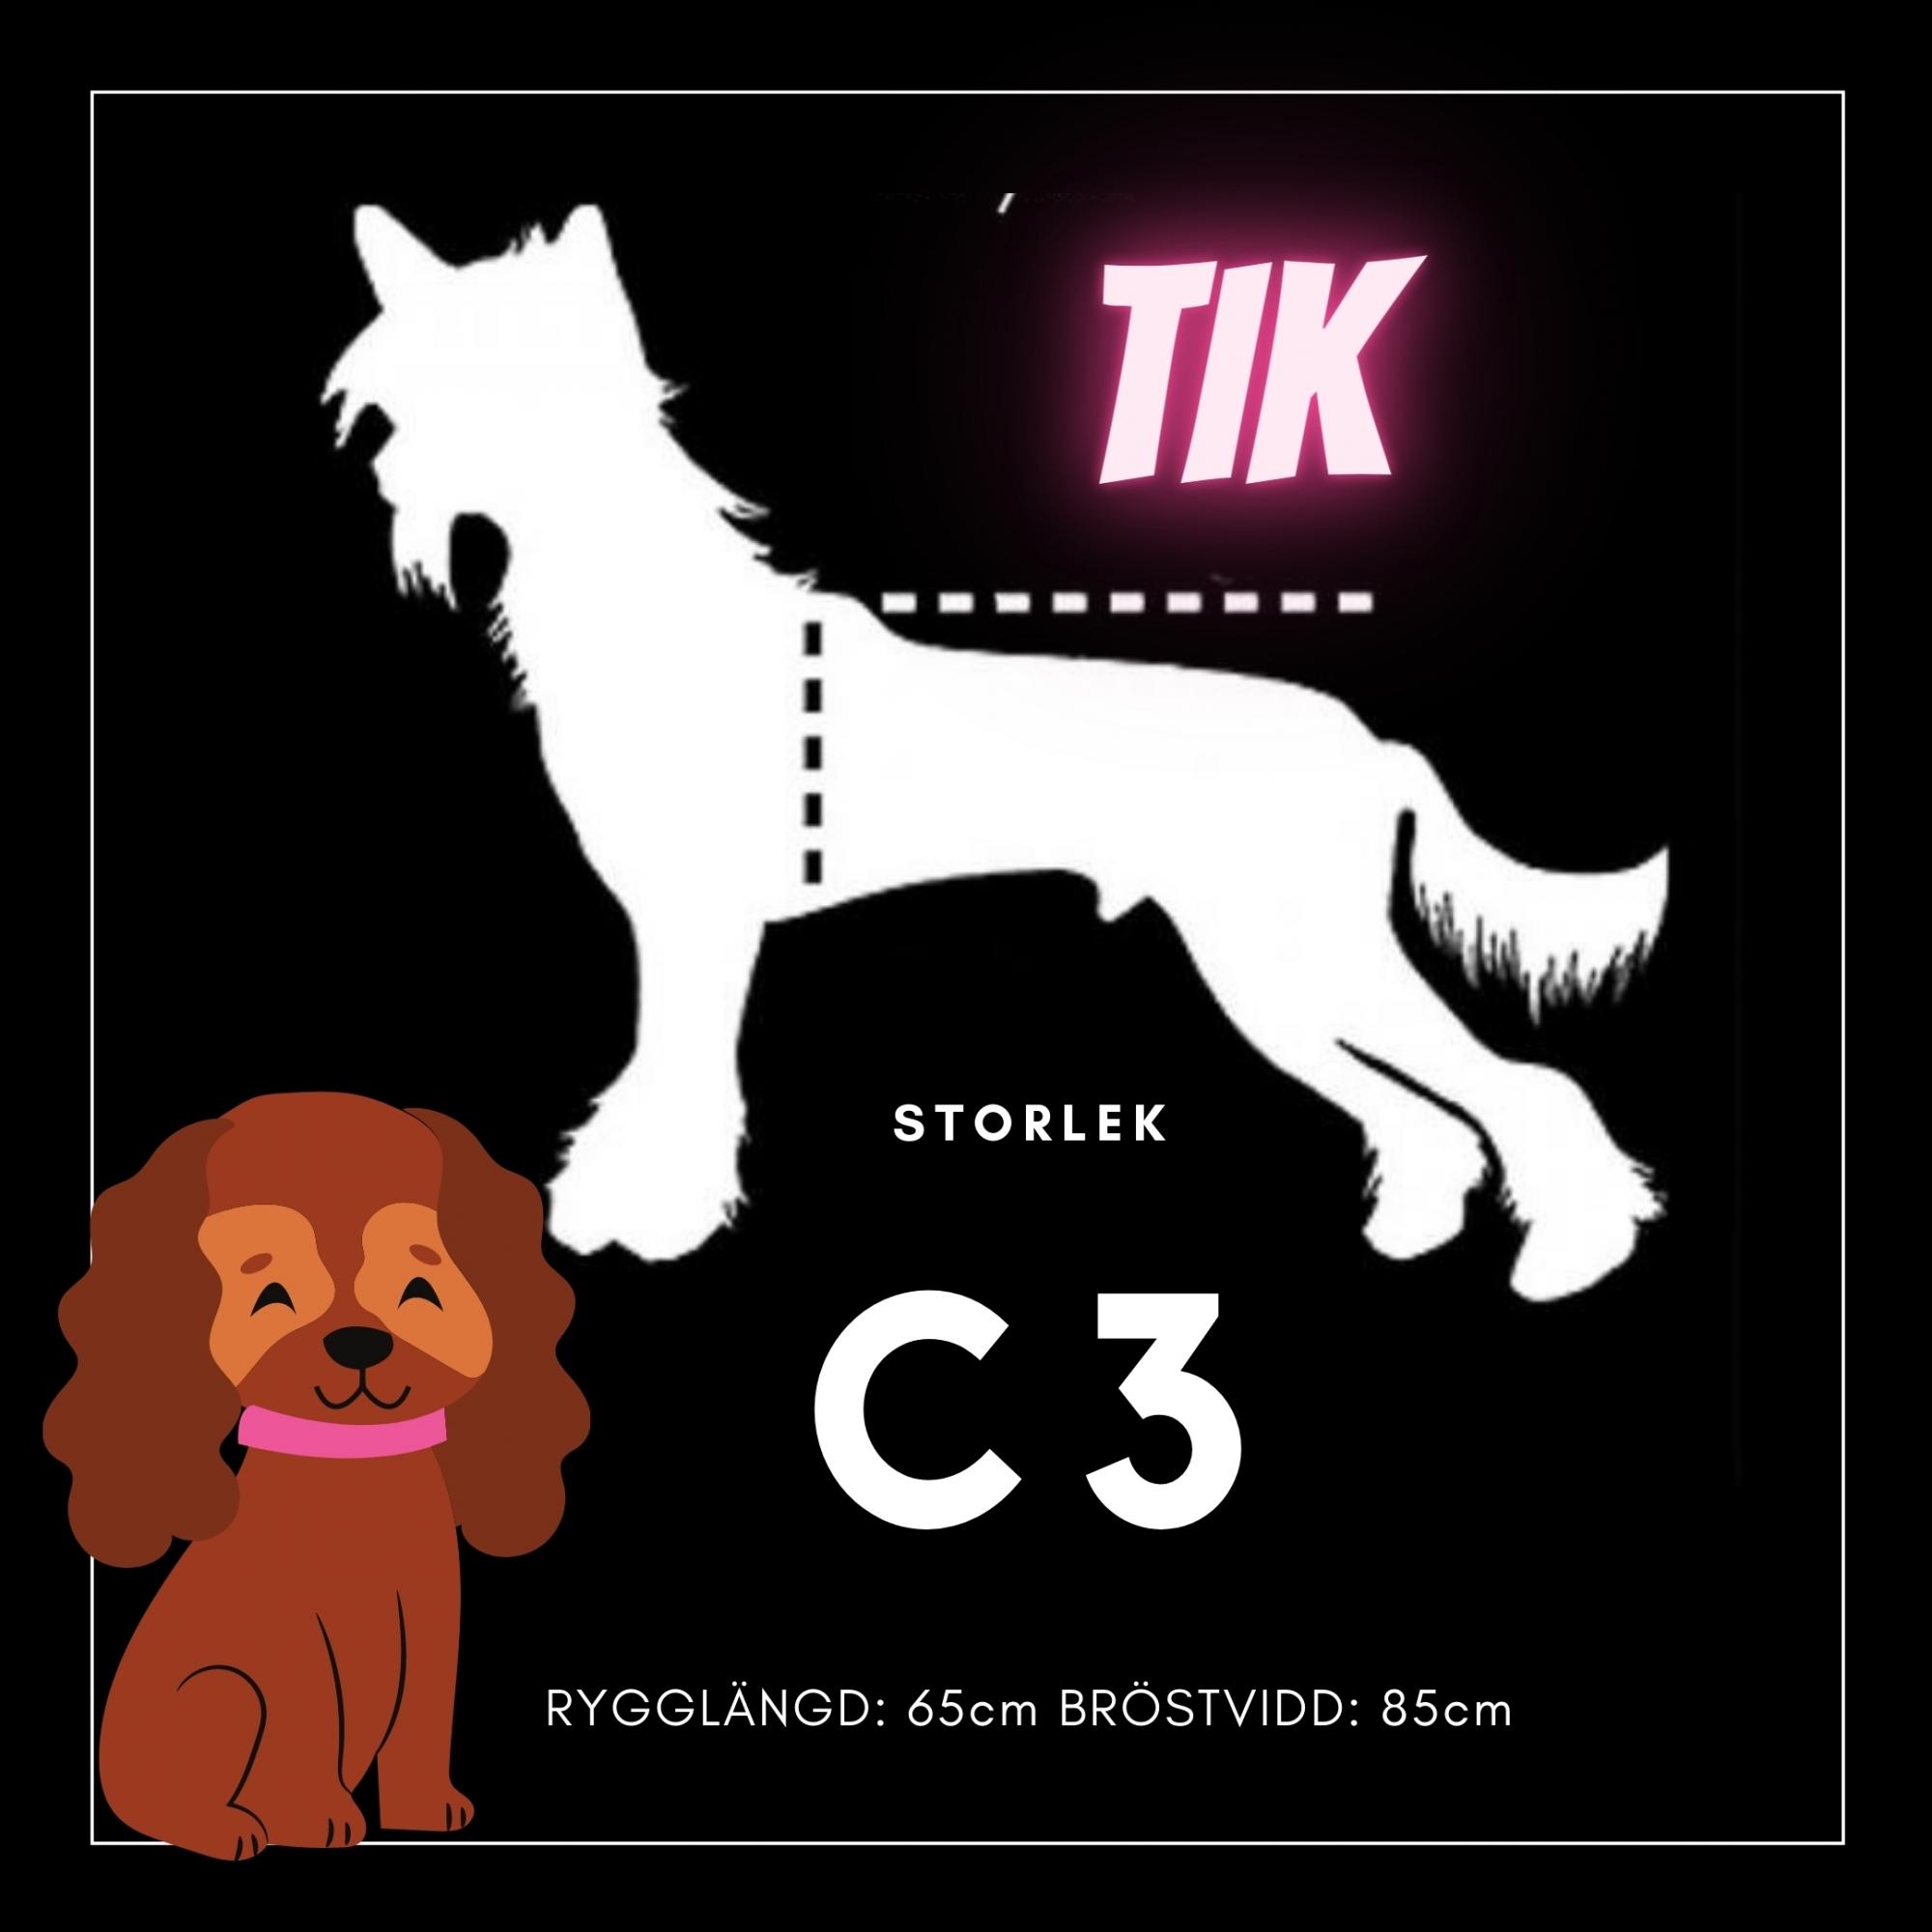 Tik Storlek C3 - Passion For Pet Fashion